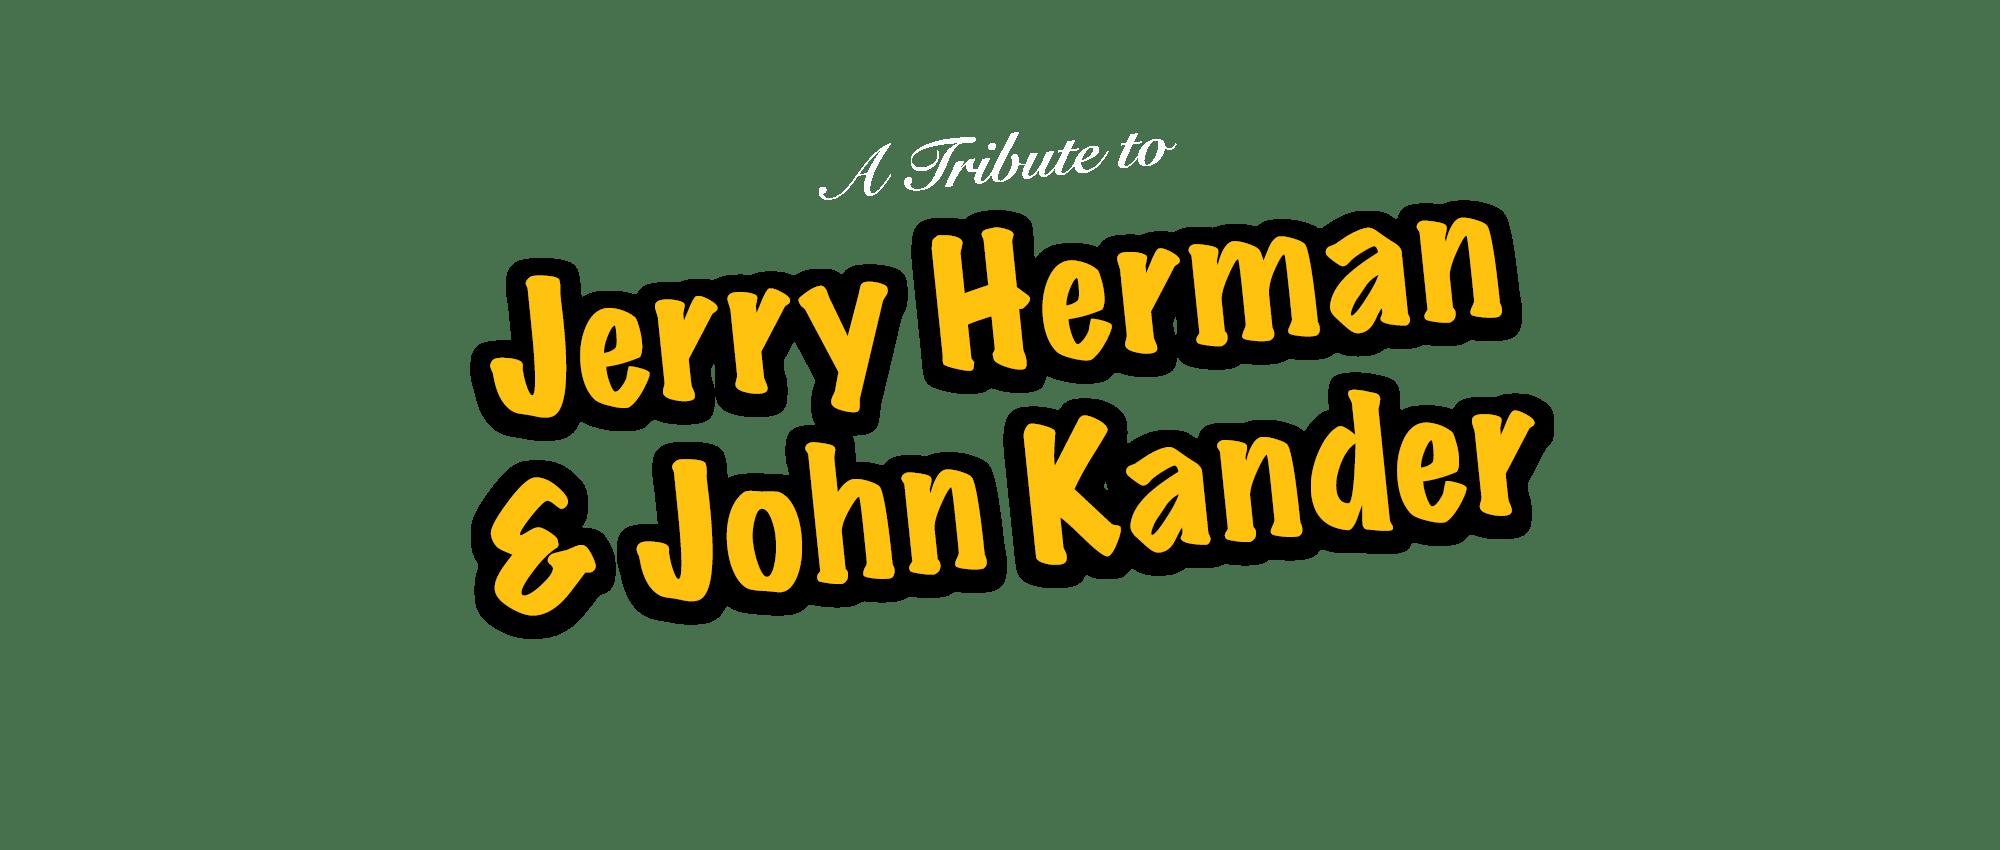 Tribute to Jerry Herman & John Kander